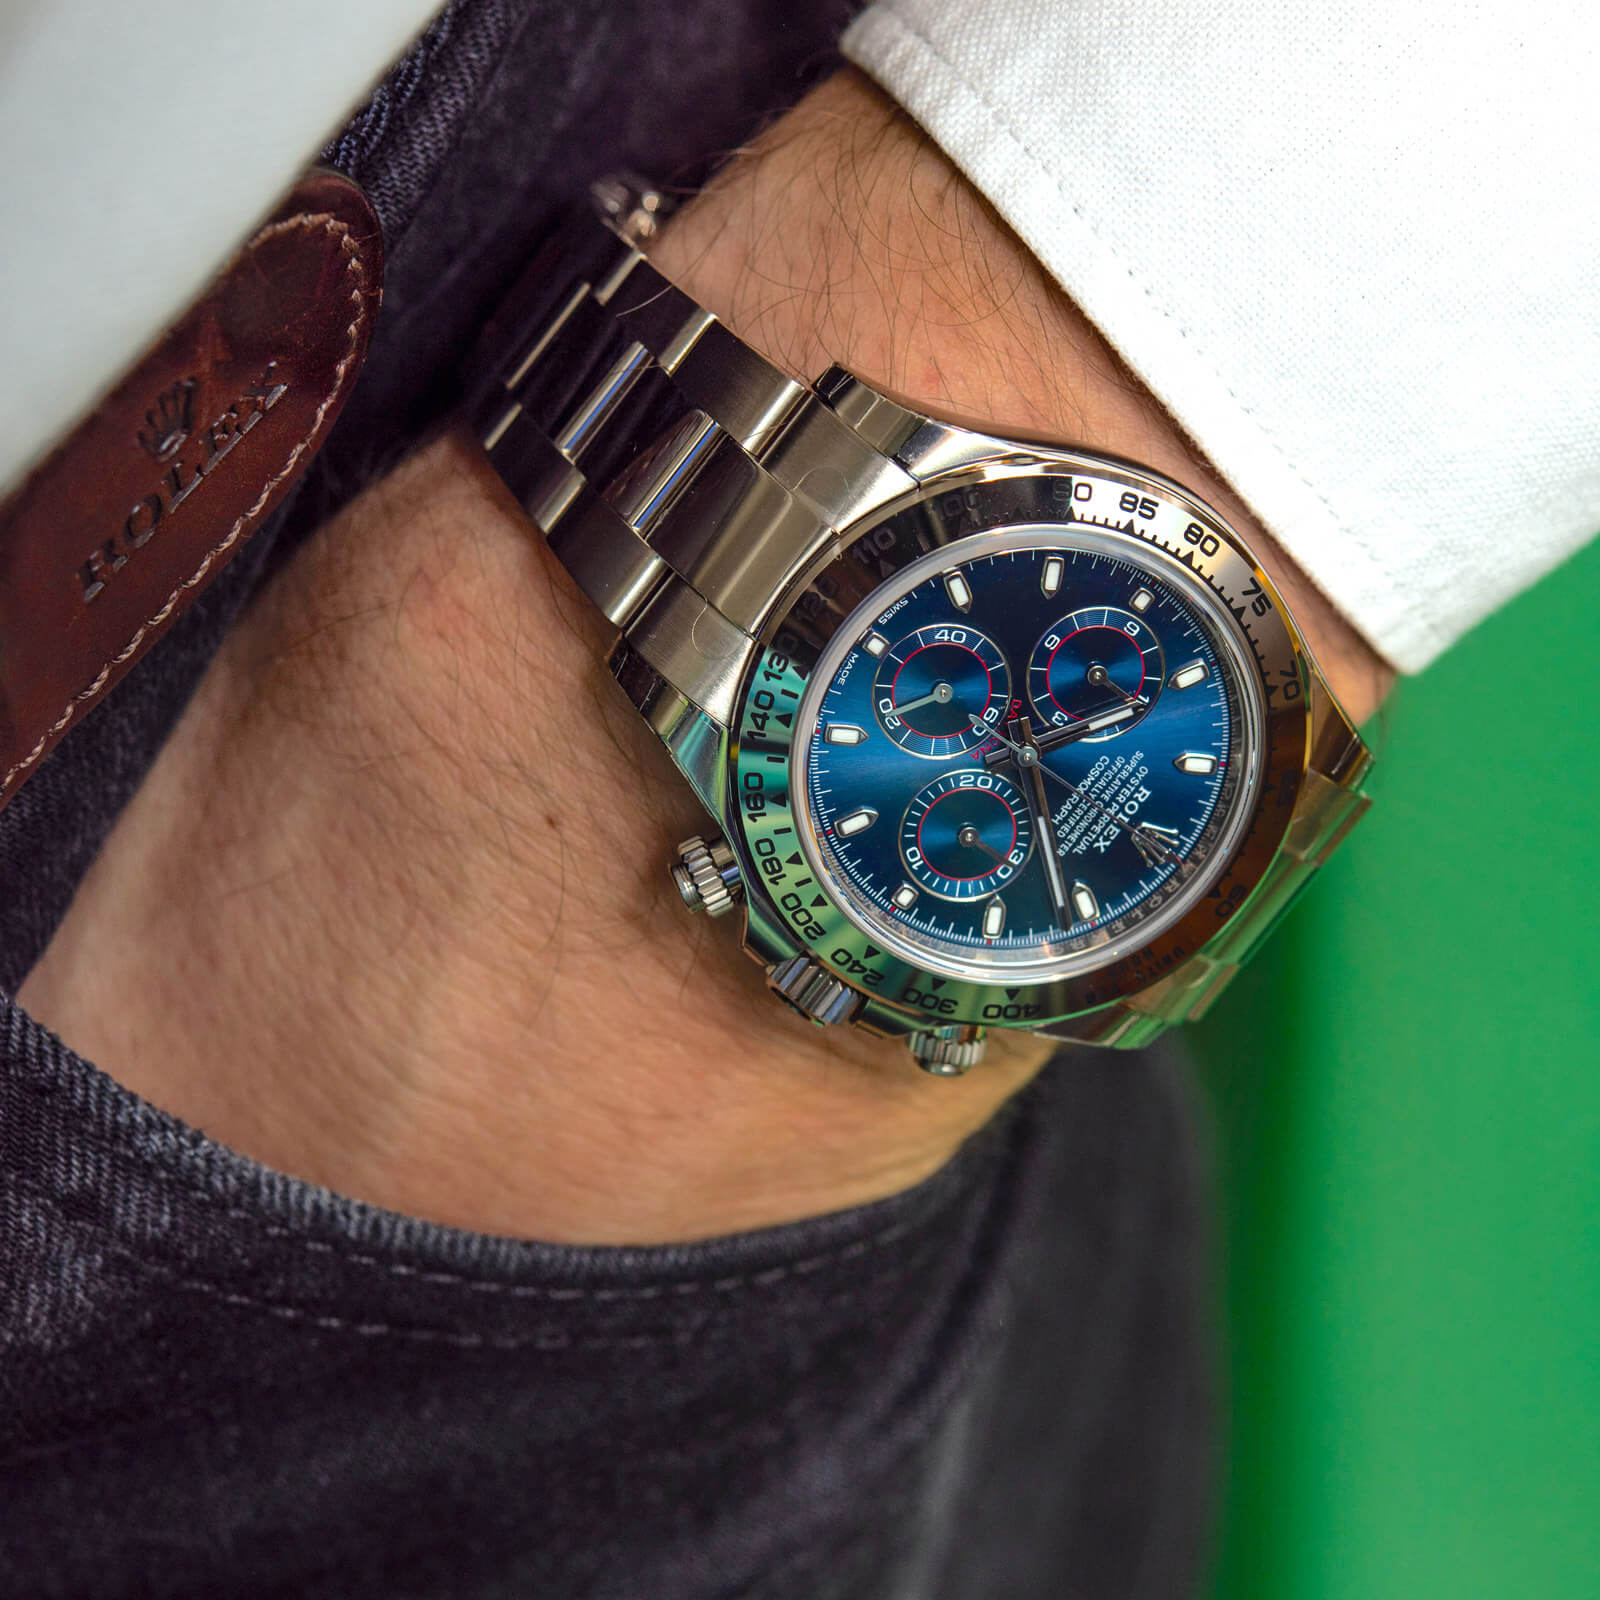 Rolex Cosmograph Daytona – Ref. 116509